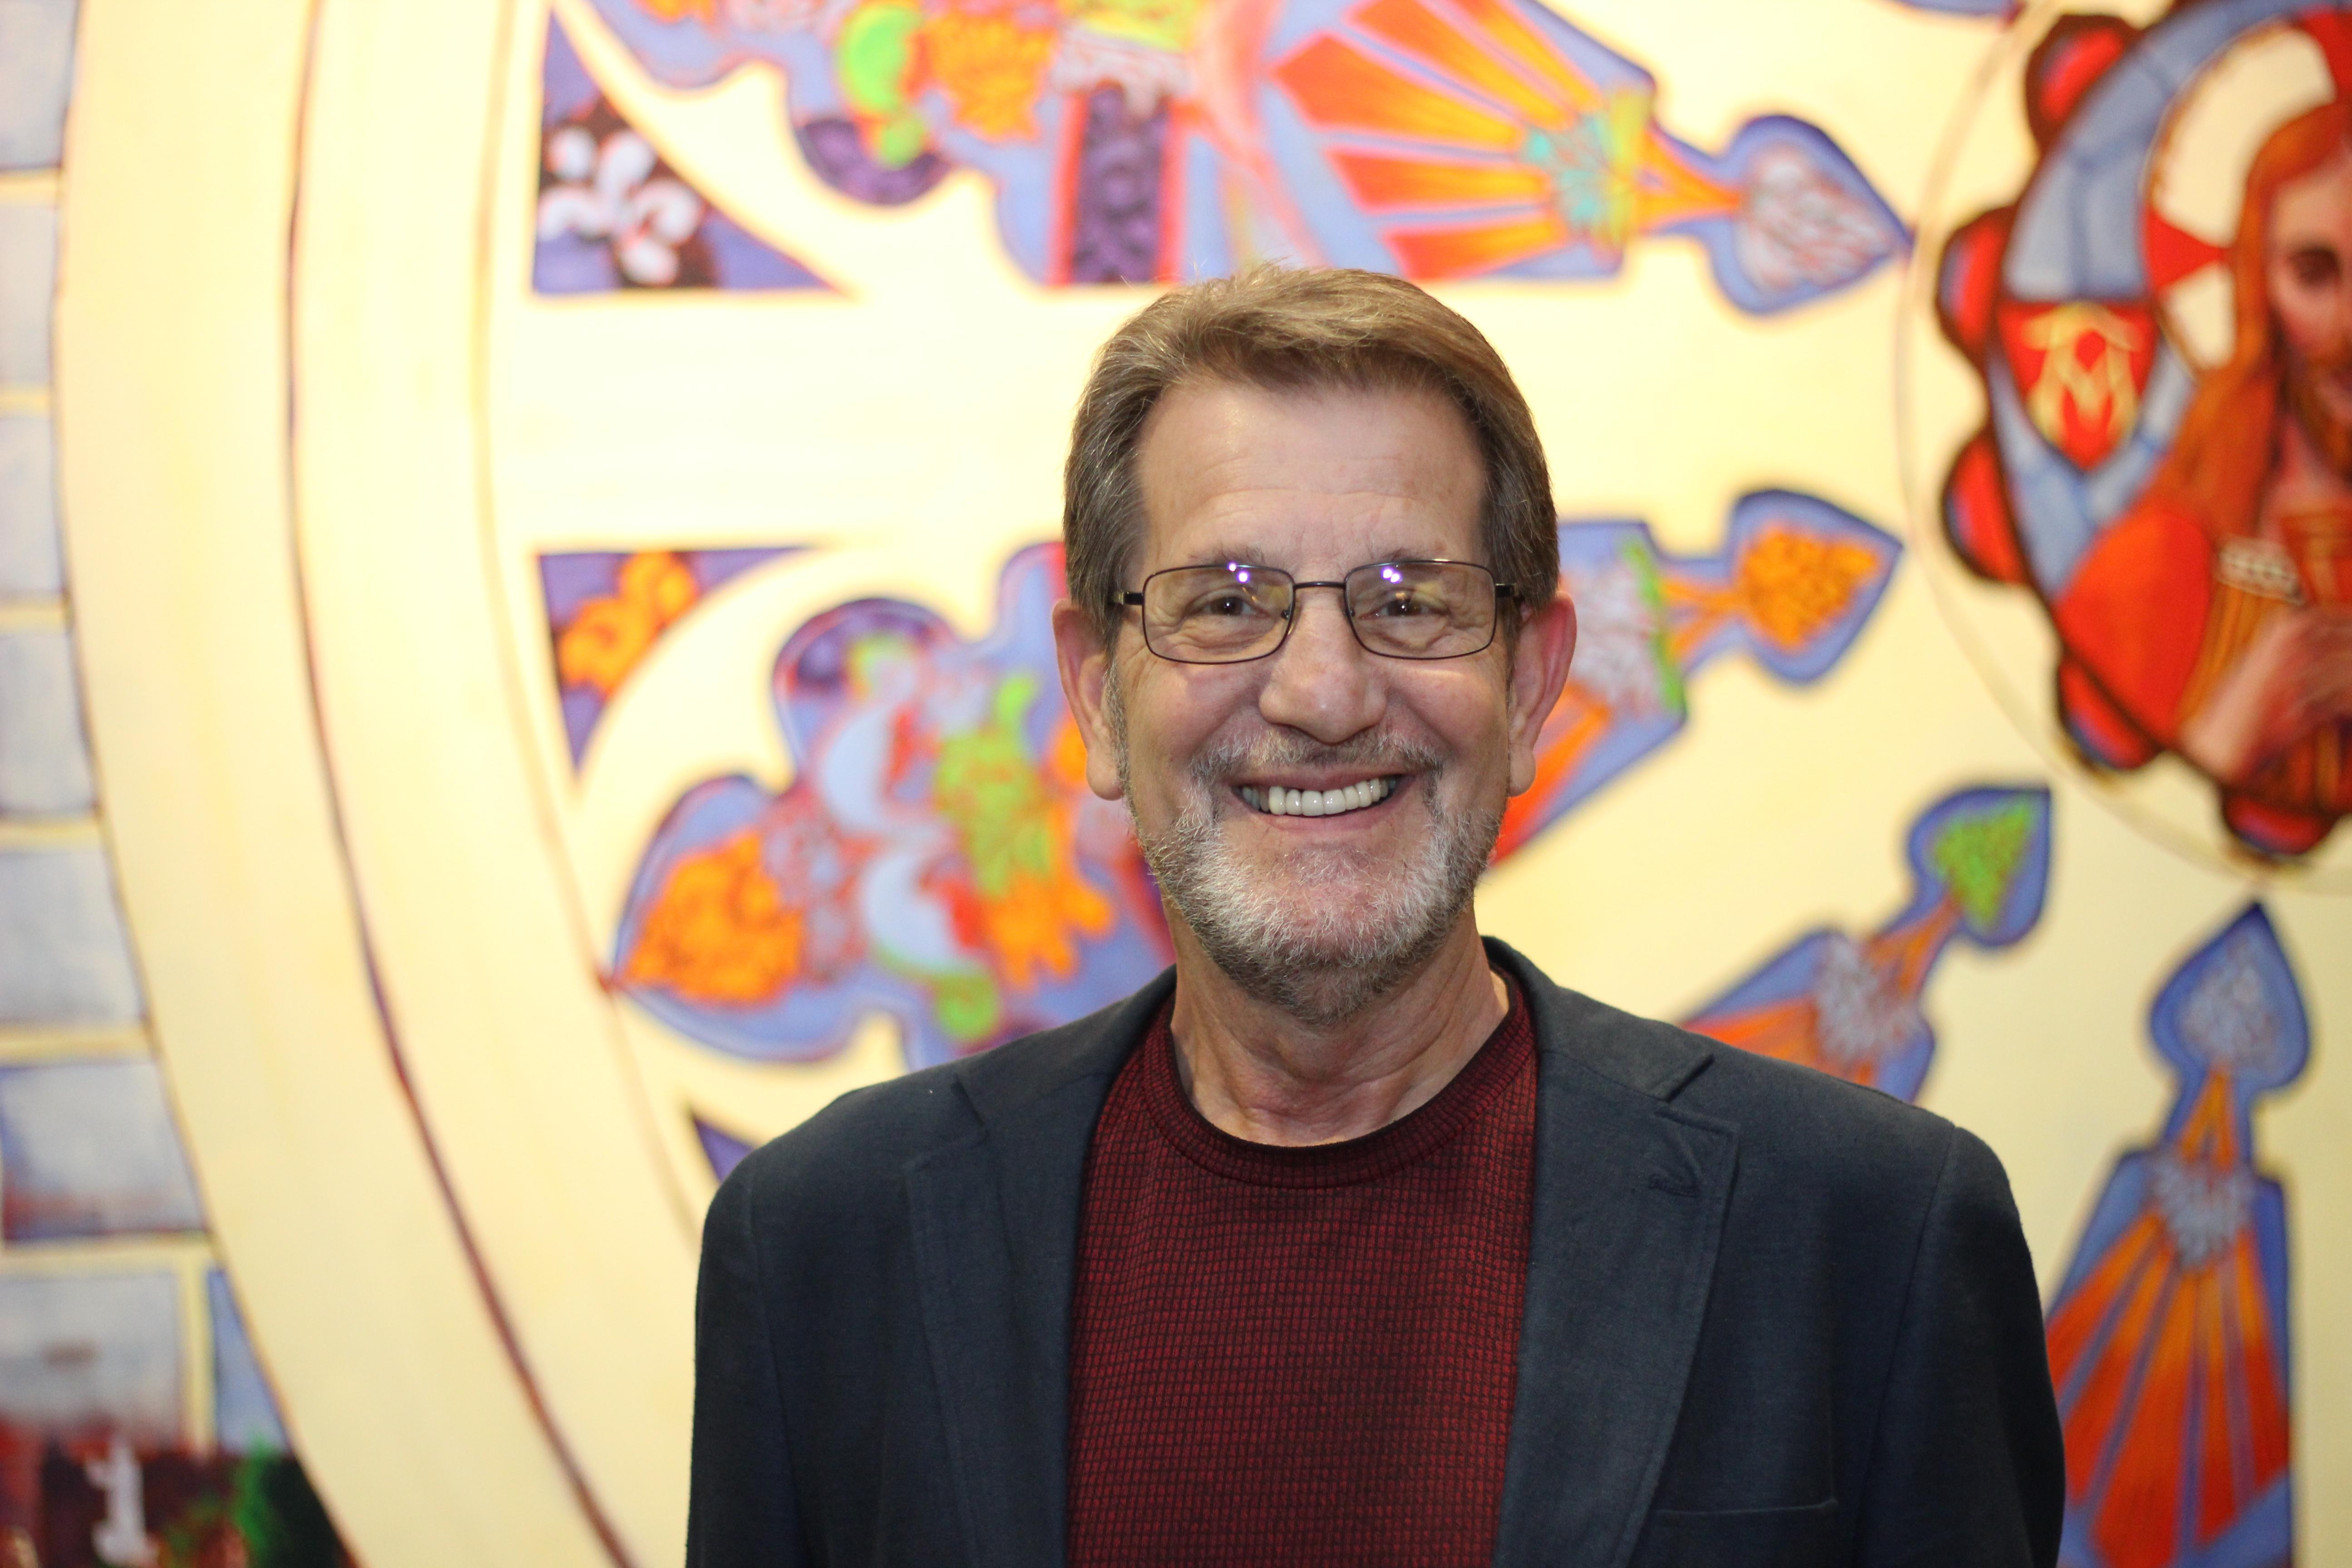 Rod Hocott